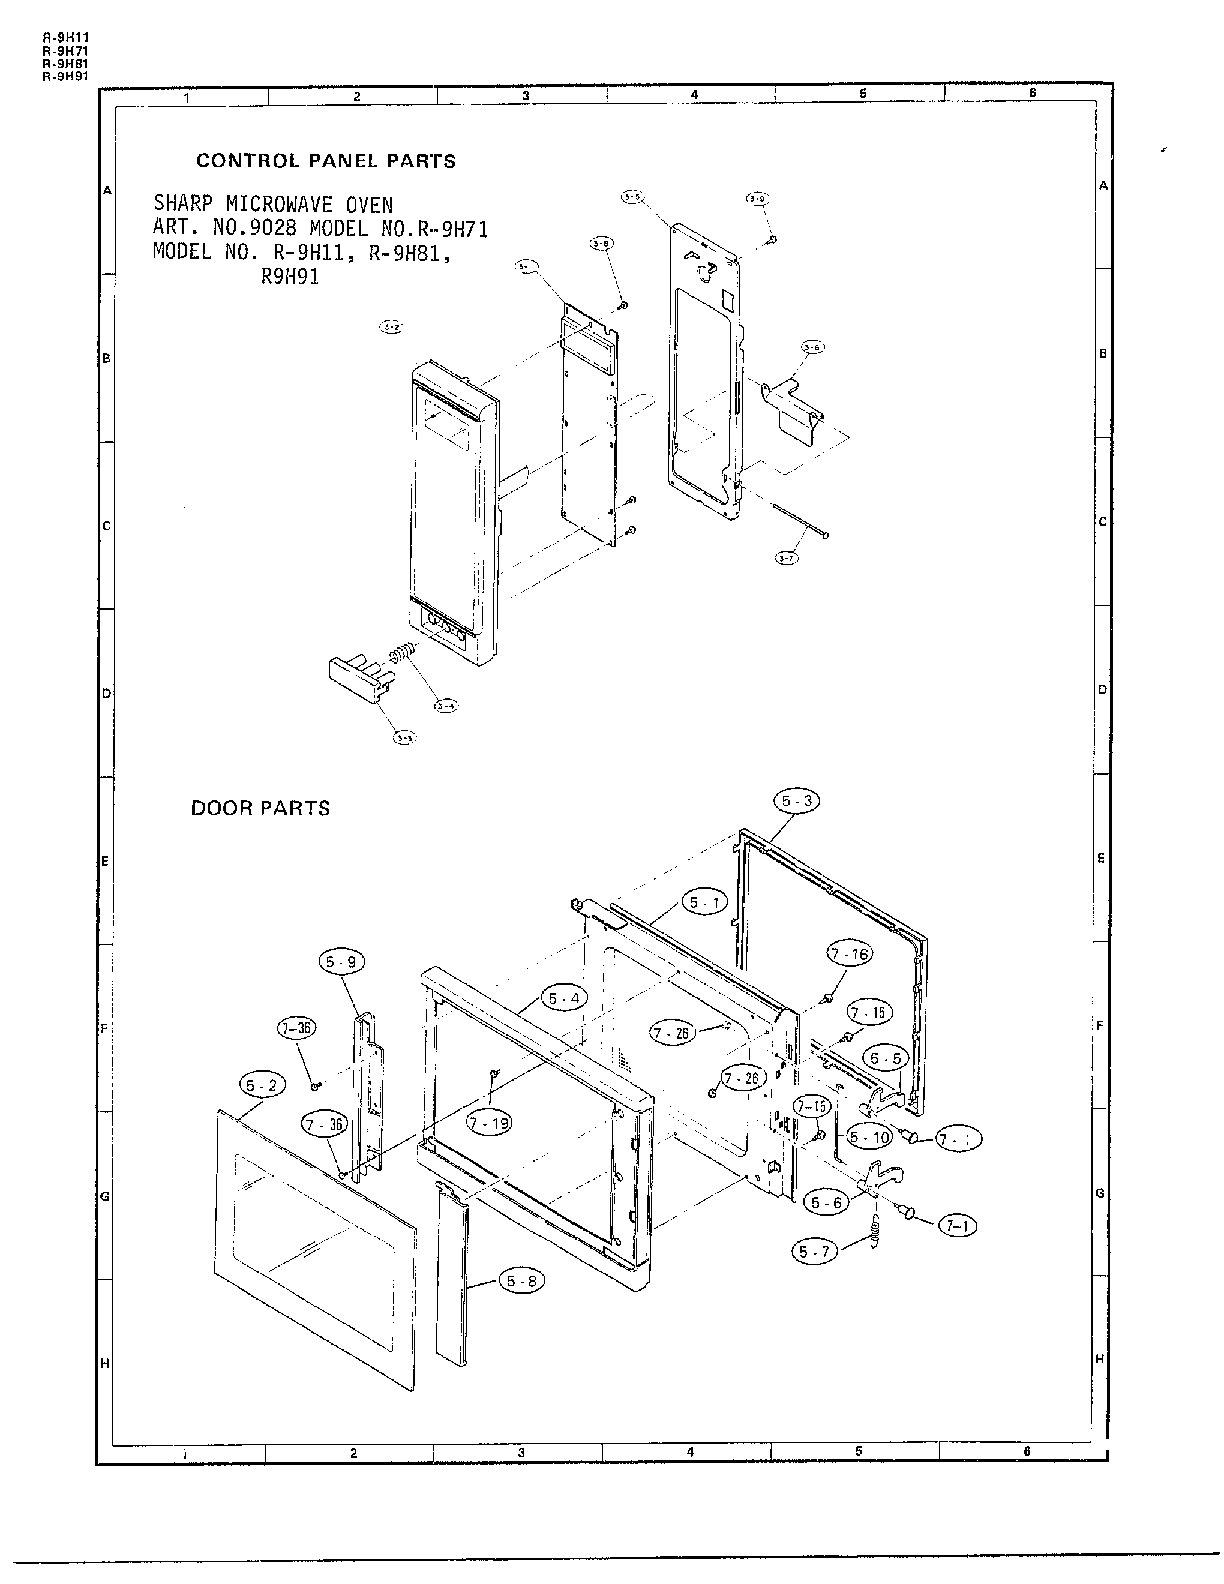 Sharp model R-9H71 countertop microwave genuine parts